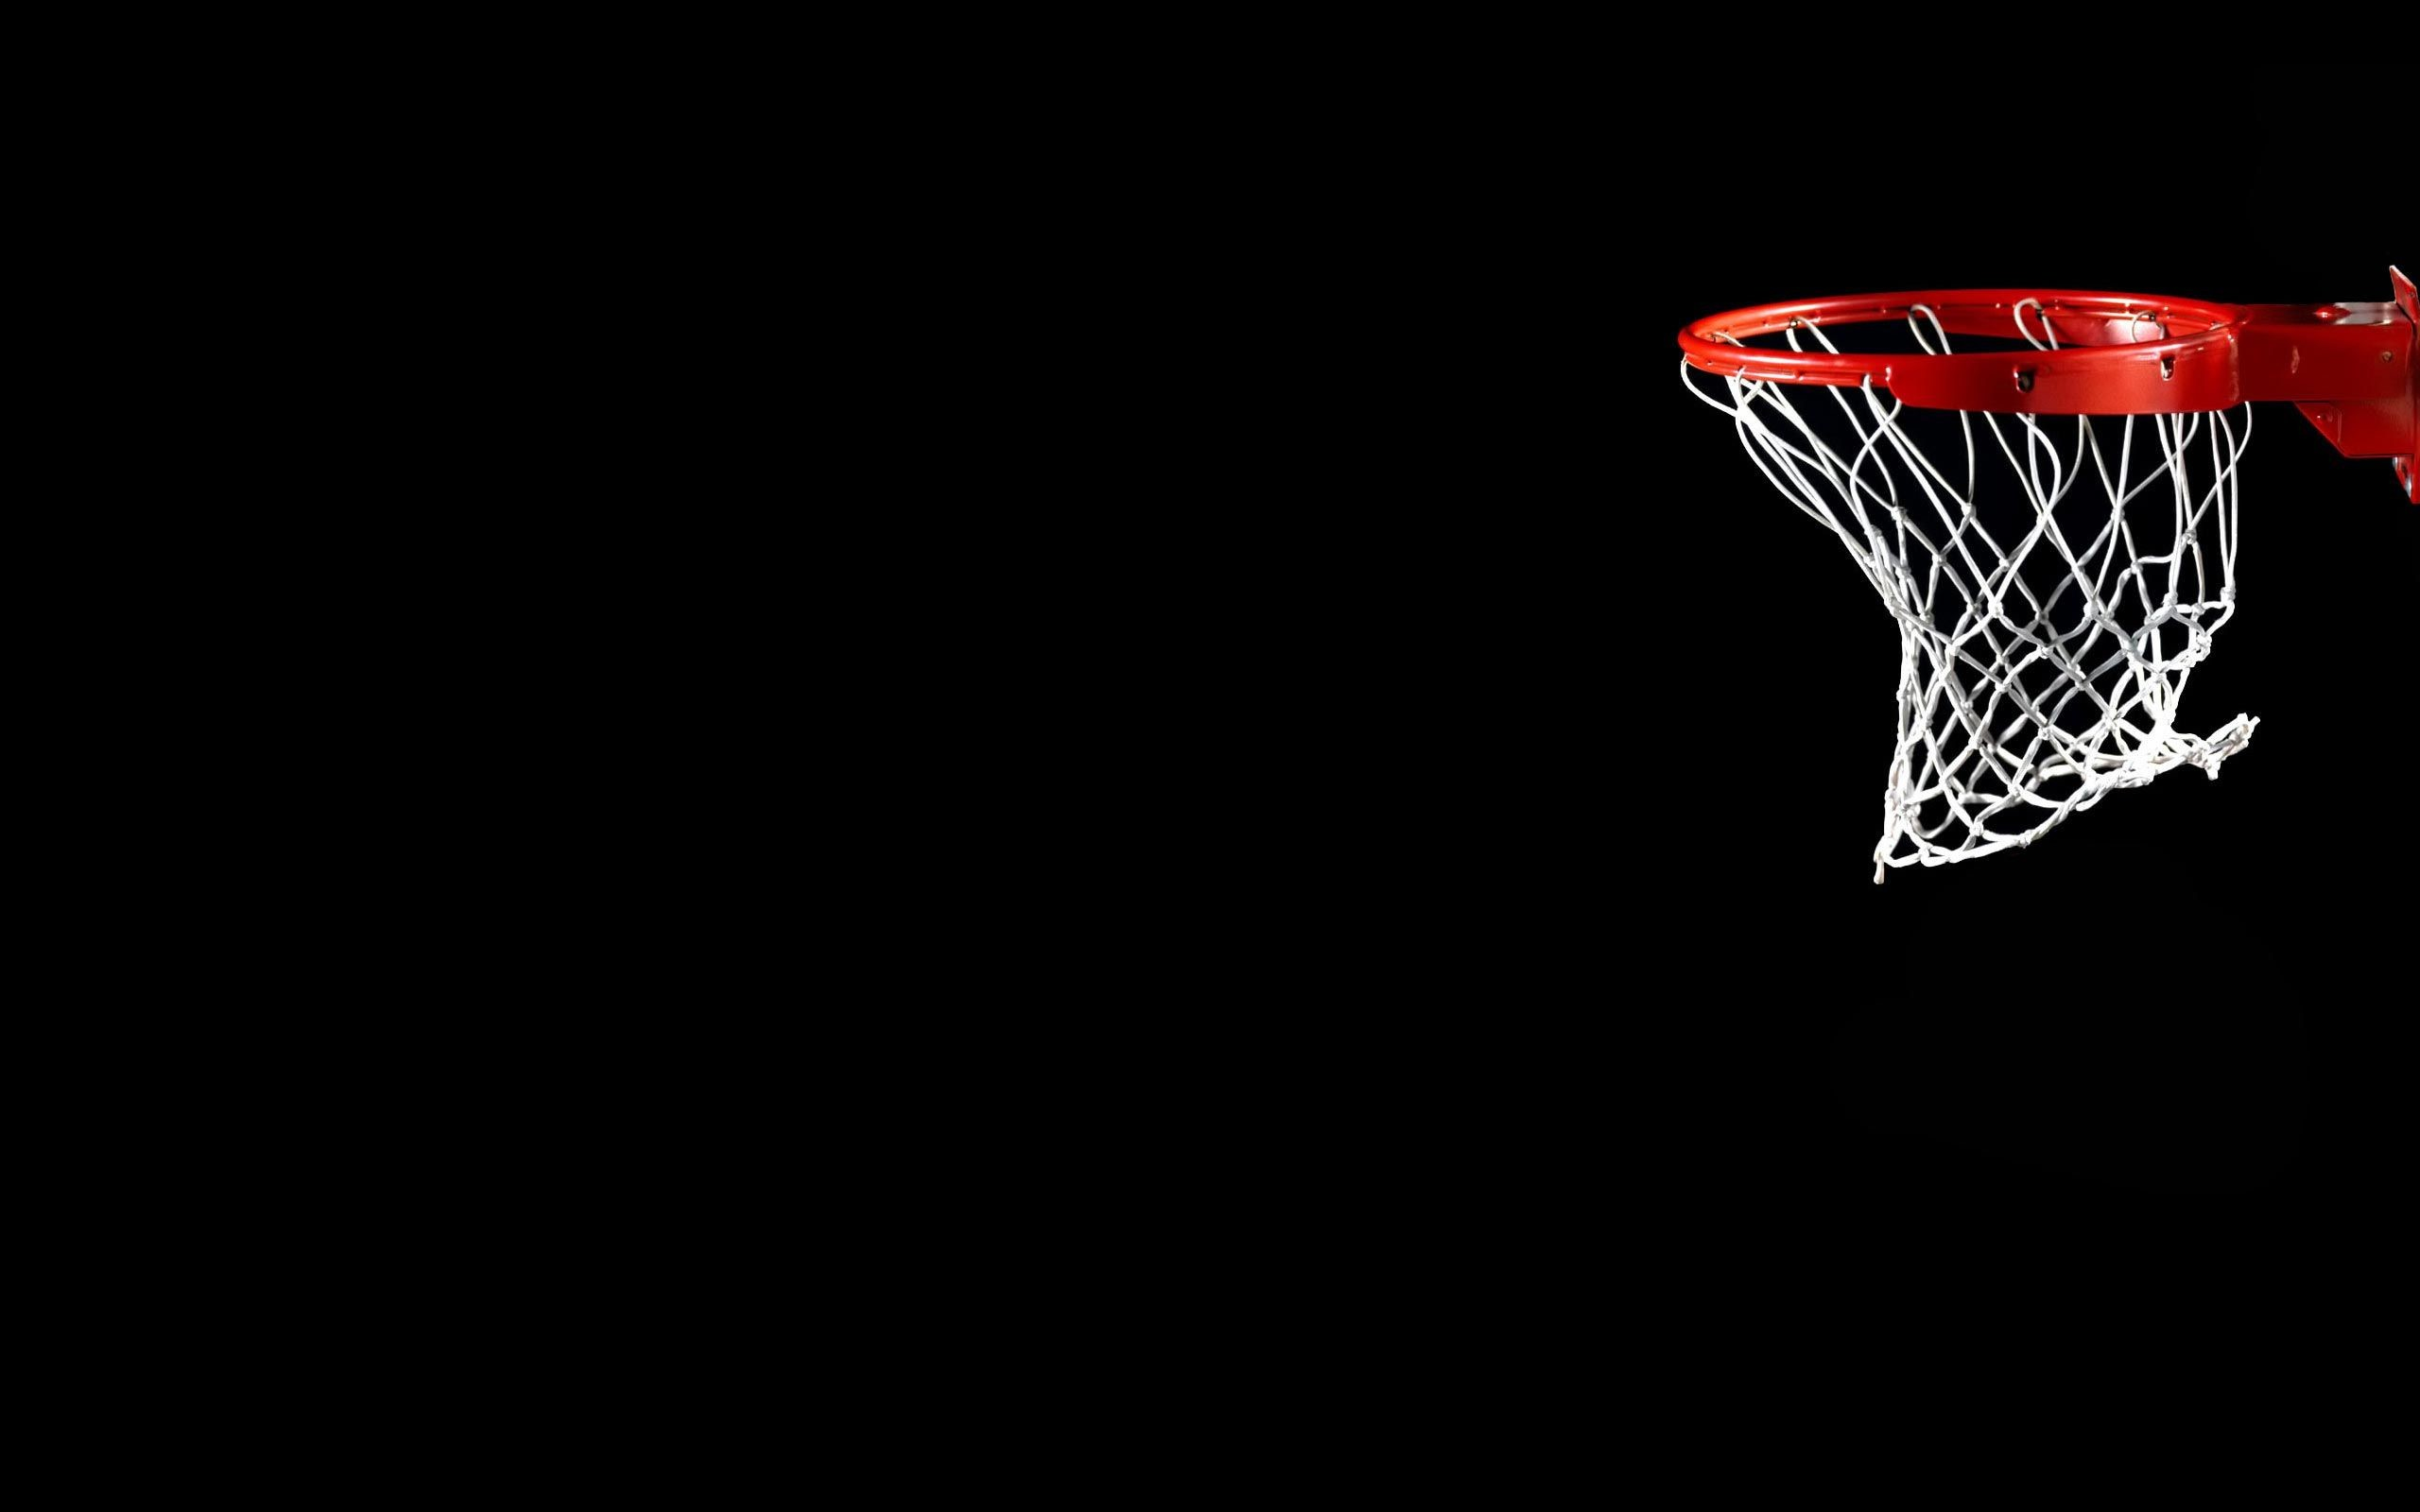 Nike Basketball Wallpapers HD Wallpapers